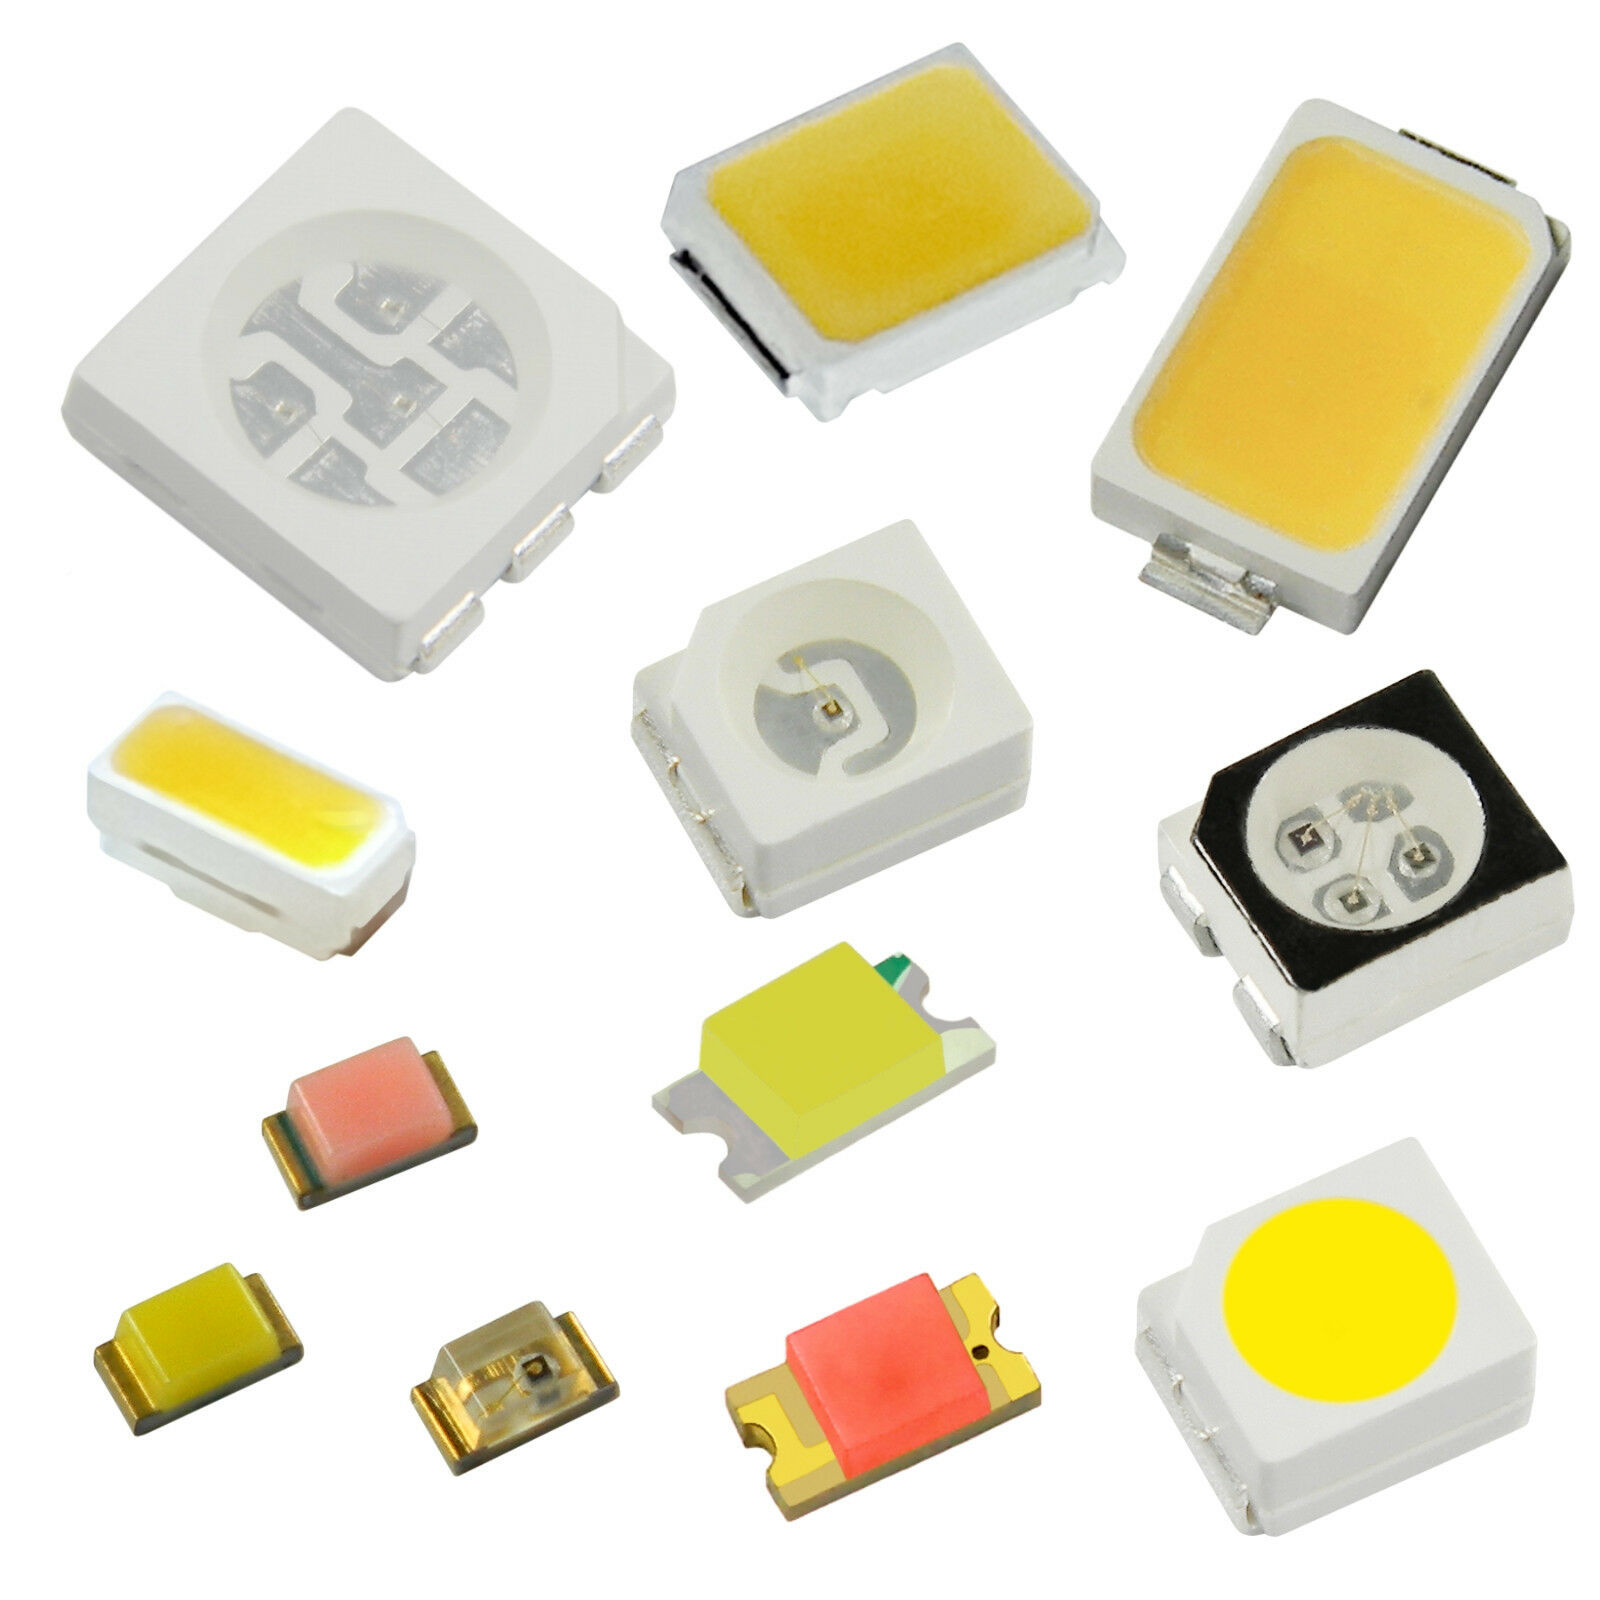 LED SMD VARI TIPI/LED SMDs MINI Diodo Lok Illuminazione Modellismo